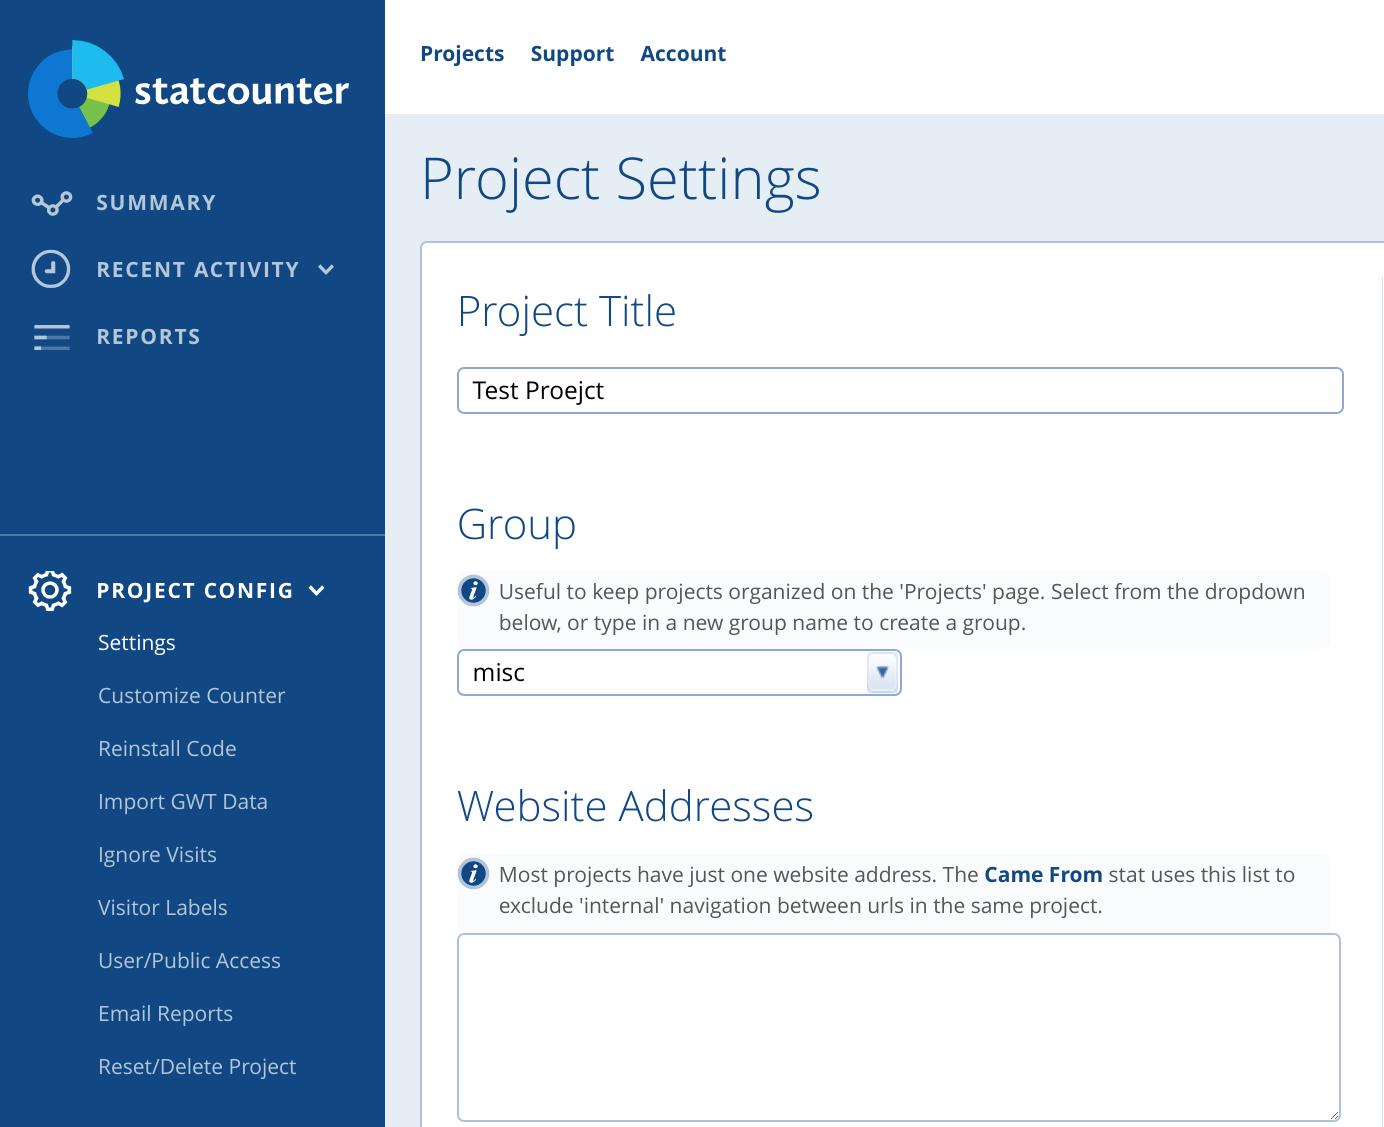 New Reports Dashboard & Simplified Navigation – Statcounter